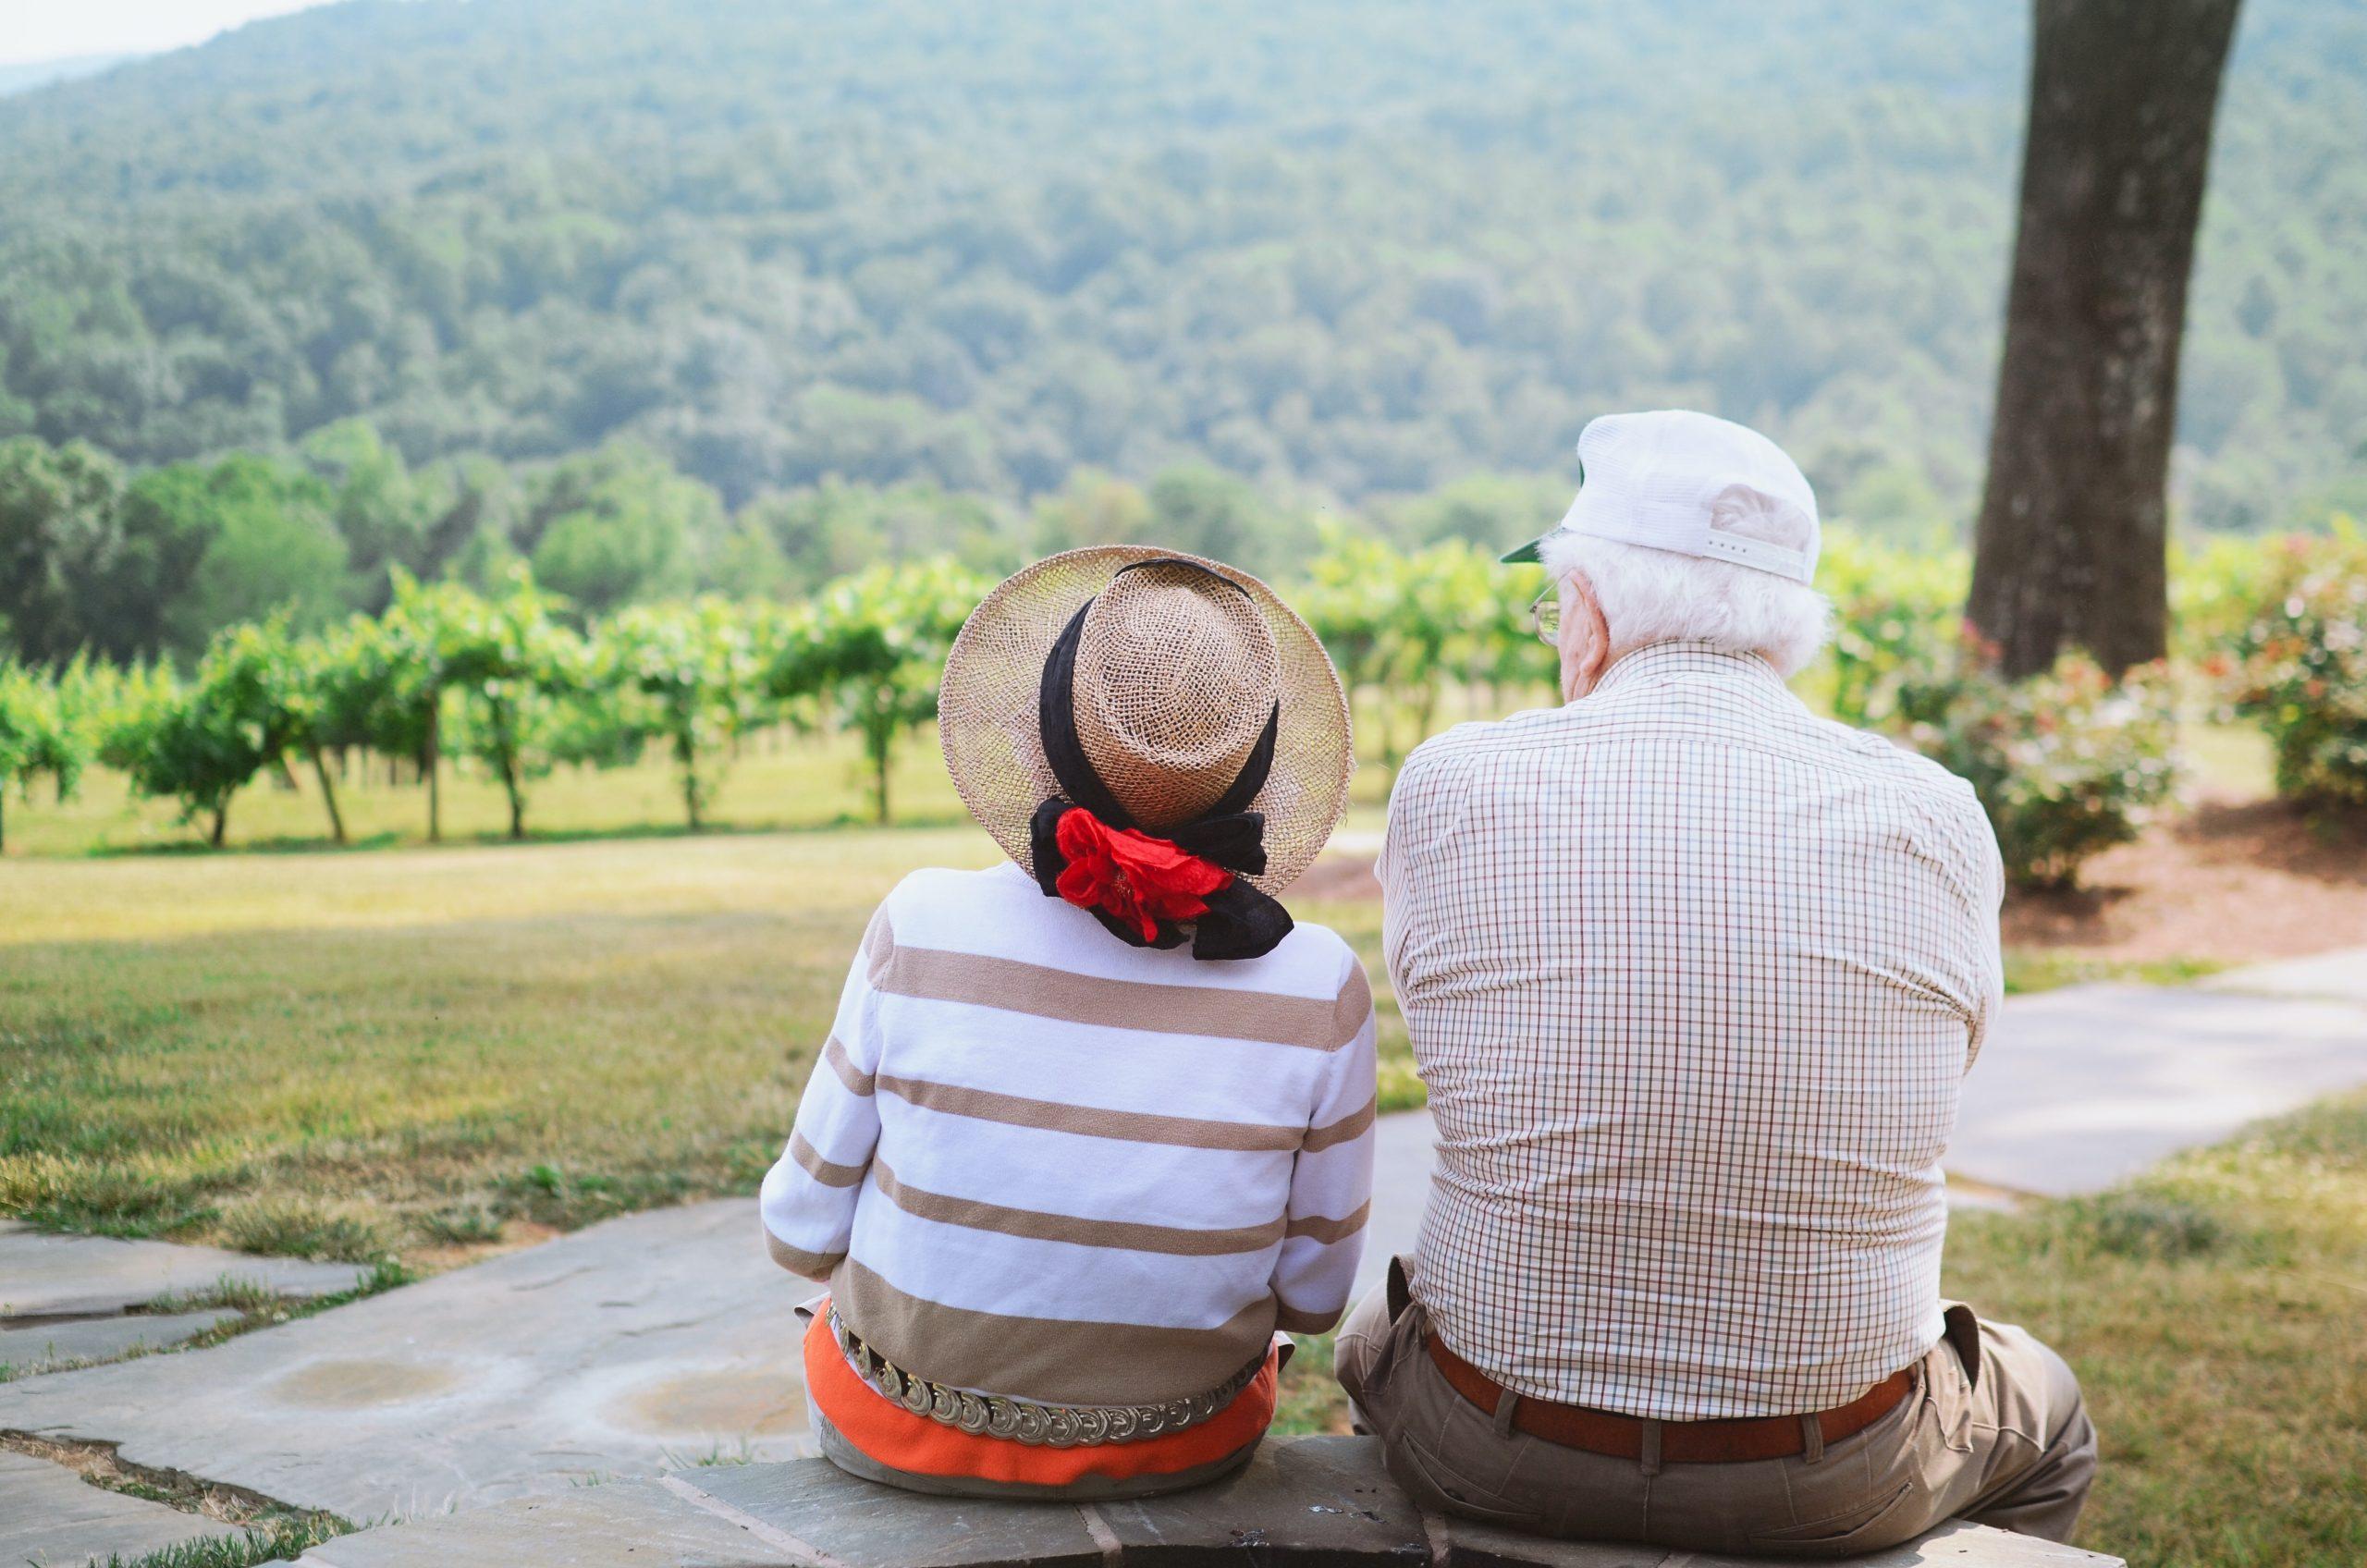 Understanding Intimate Relationships on the Spectrum